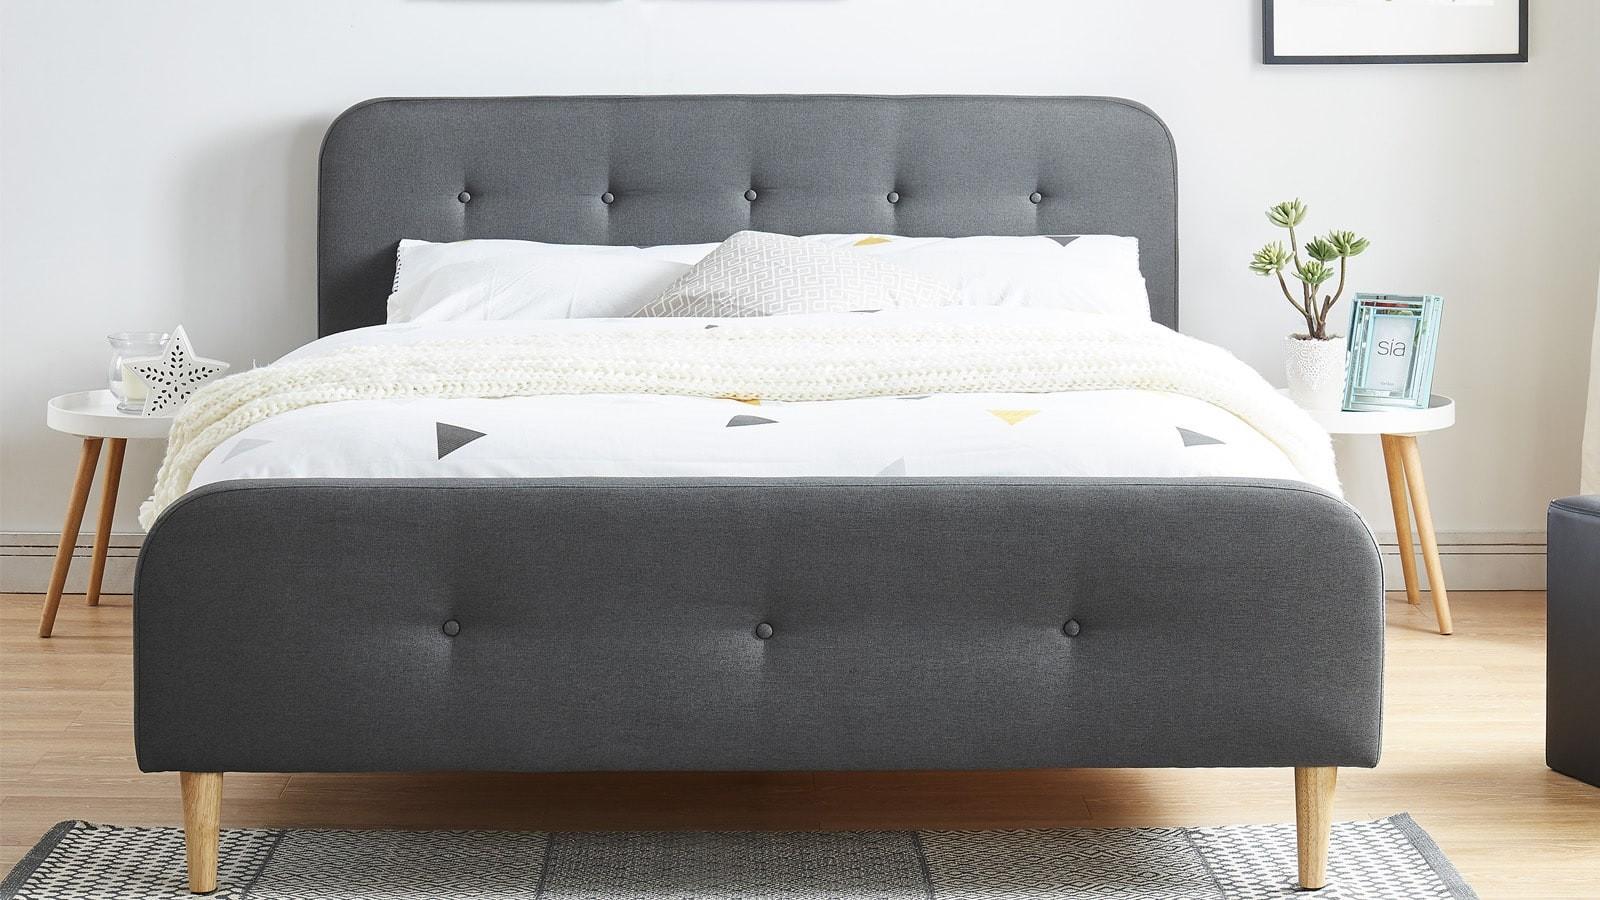 lit adulte scandinave en tissu gris fonc capitonn sommier latte 160x200 collection mark. Black Bedroom Furniture Sets. Home Design Ideas